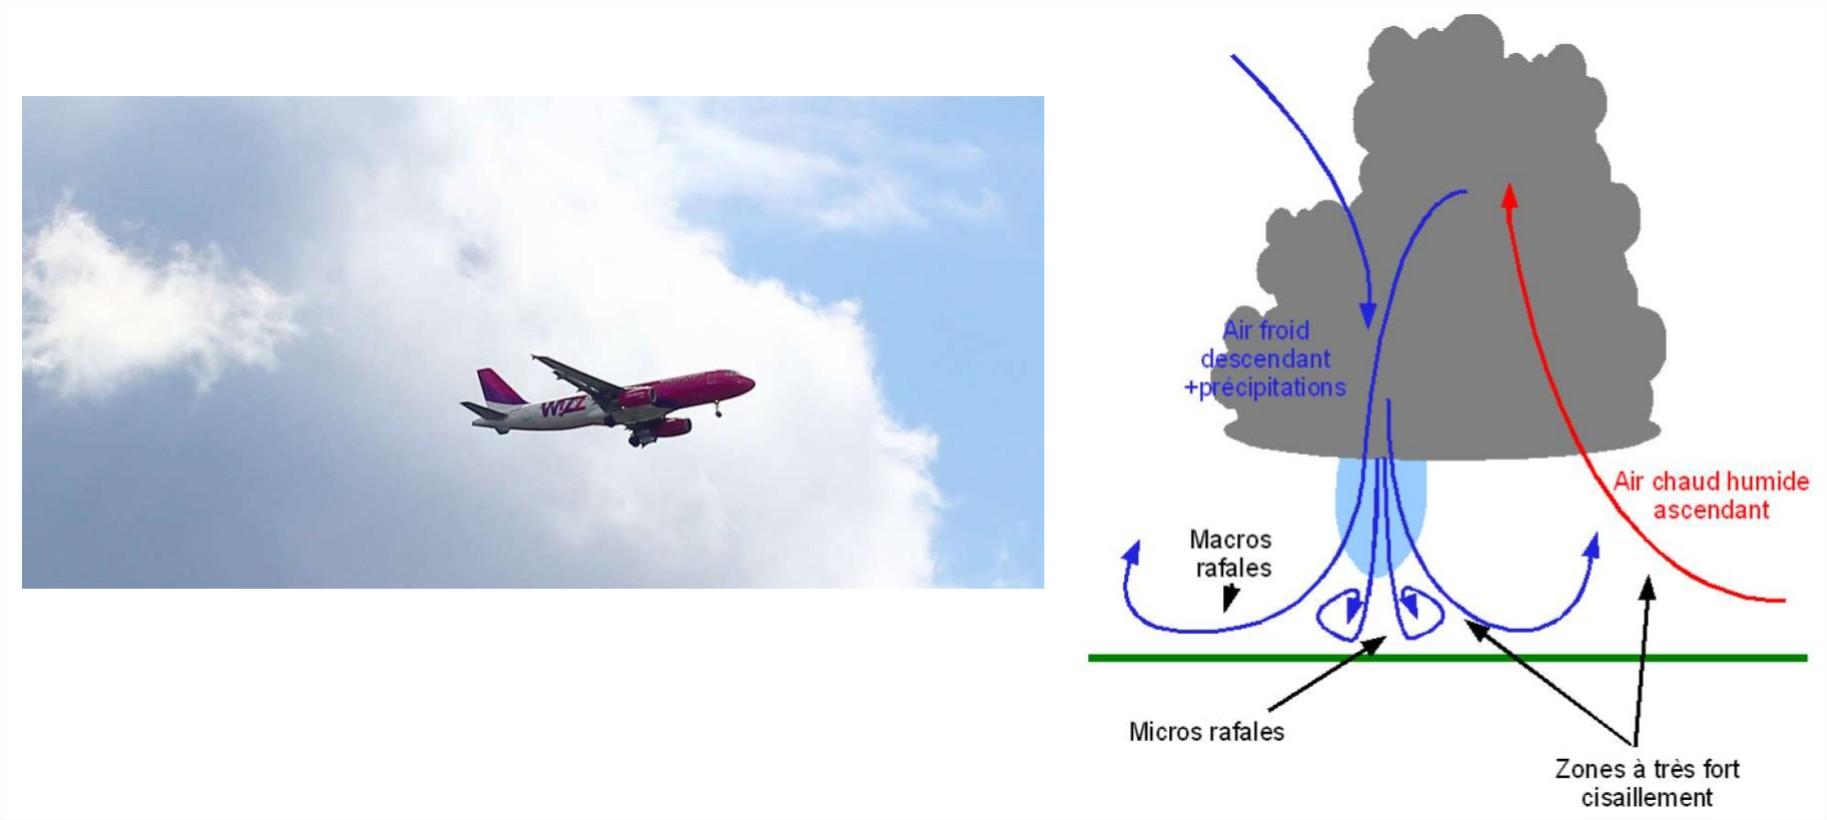 Exemple d'illustration